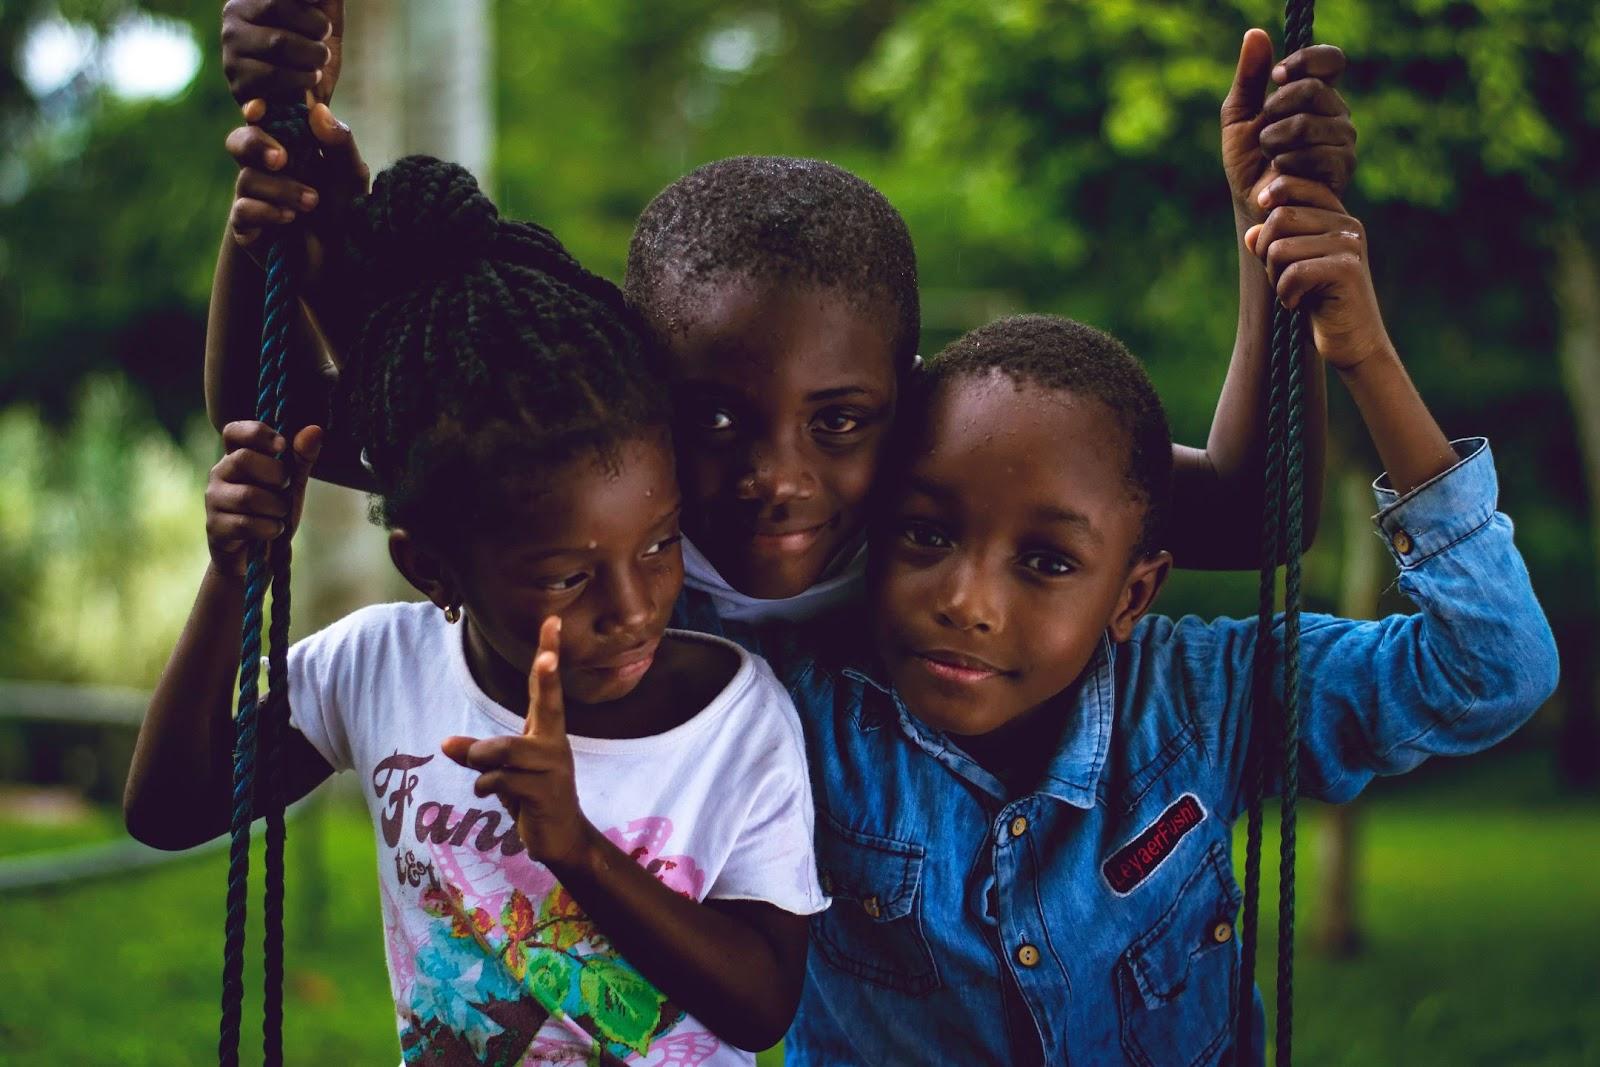 Photo of three children on a swing.